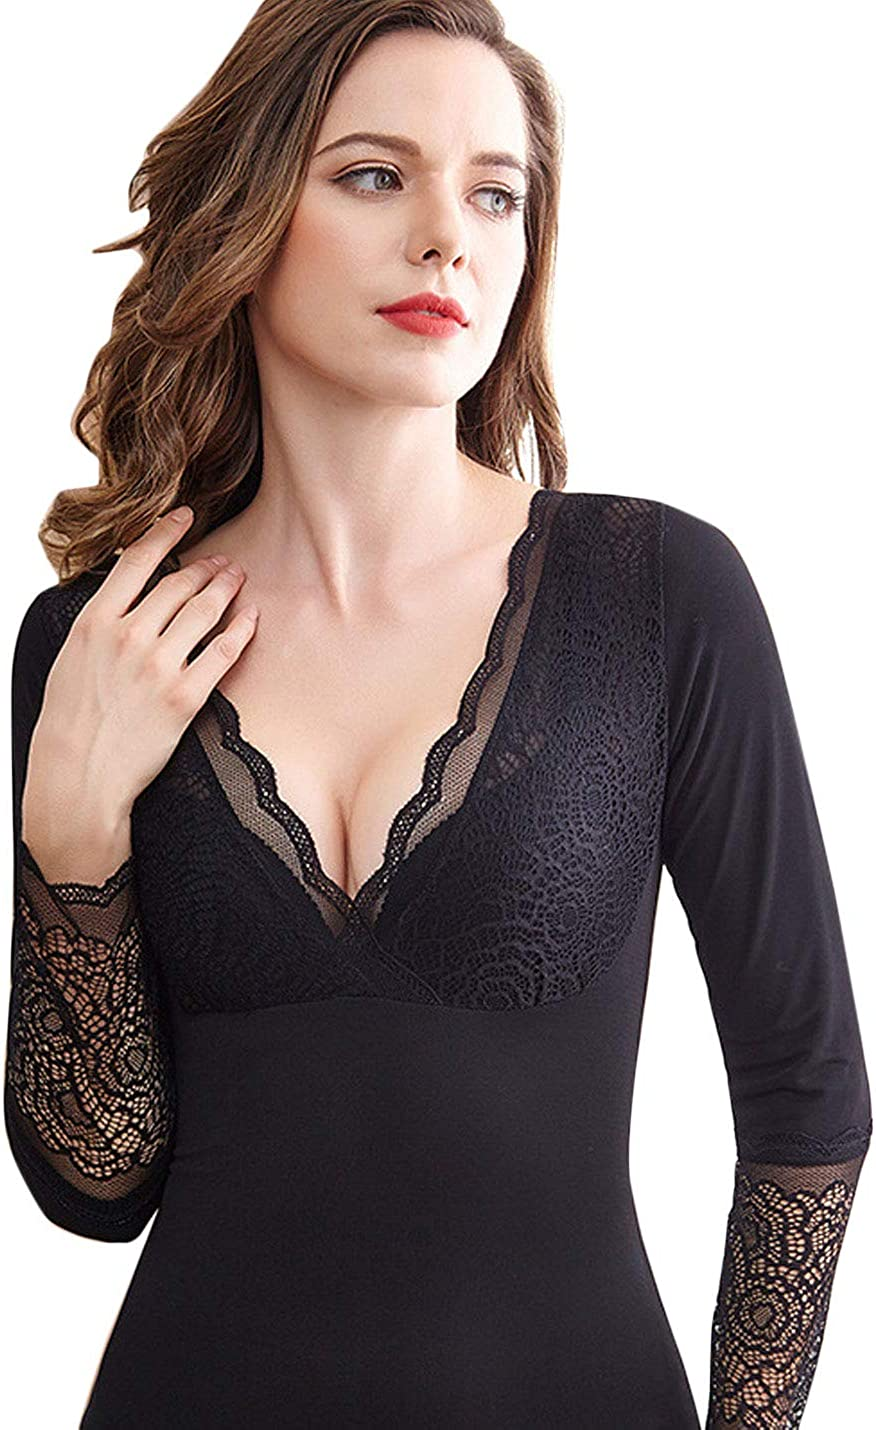 Flygo Women's Winter Shirts Long Sleeve Sleeveless V-Neck Fleece Lined Baselayer Tank Tops